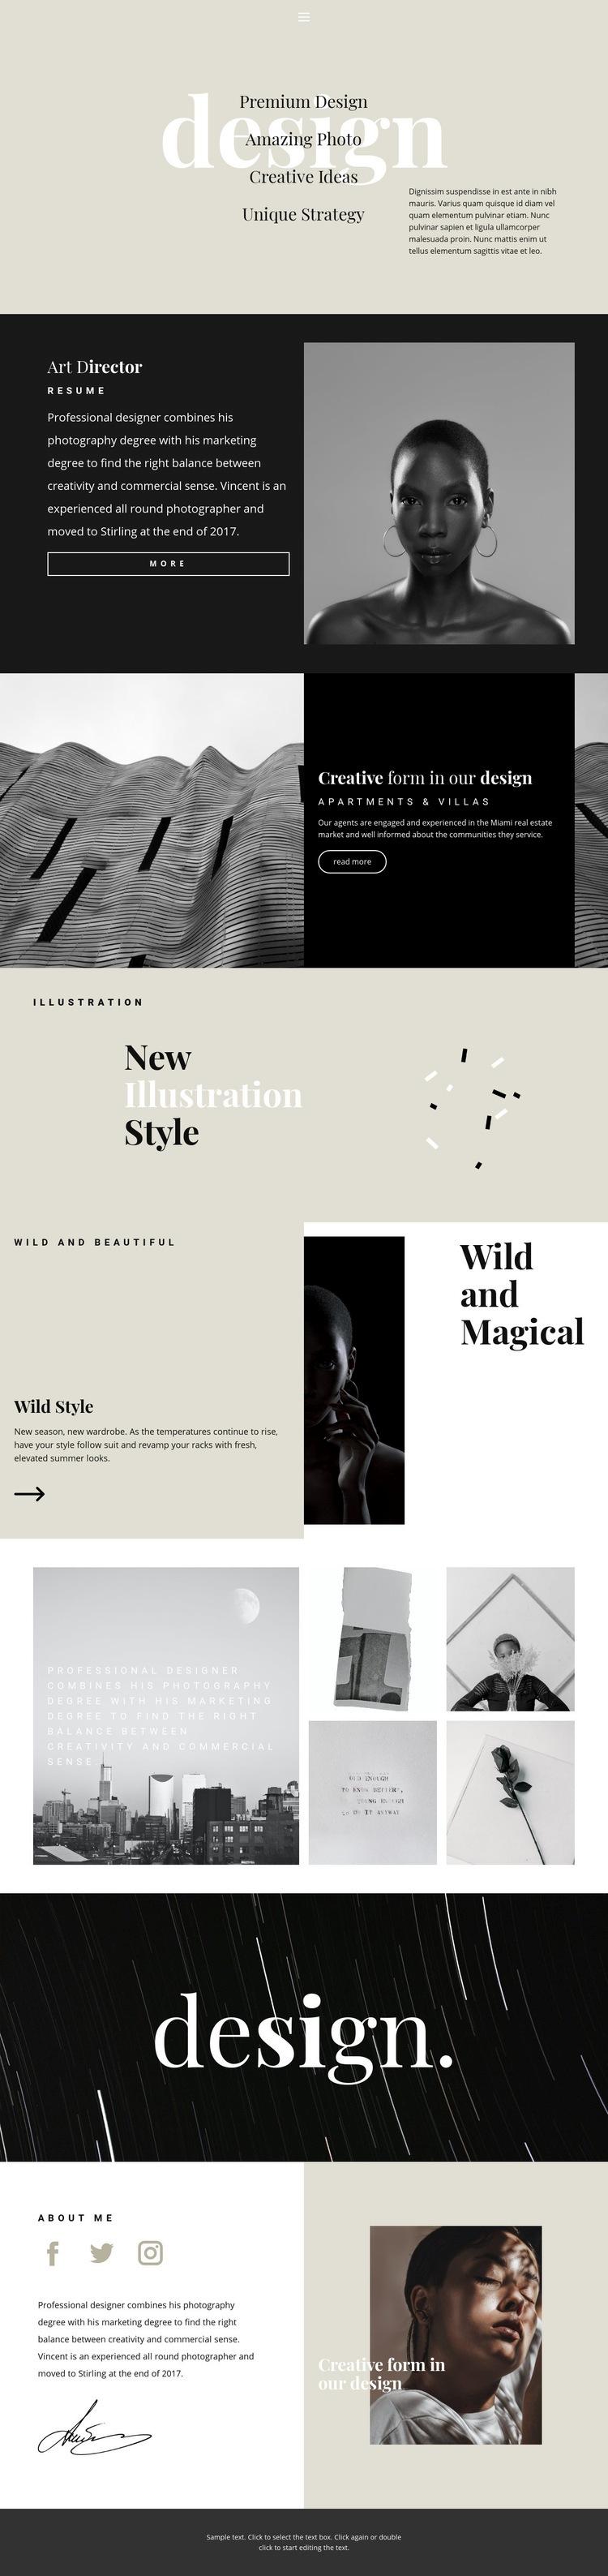 Directions of design studio Wysiwyg Editor Html